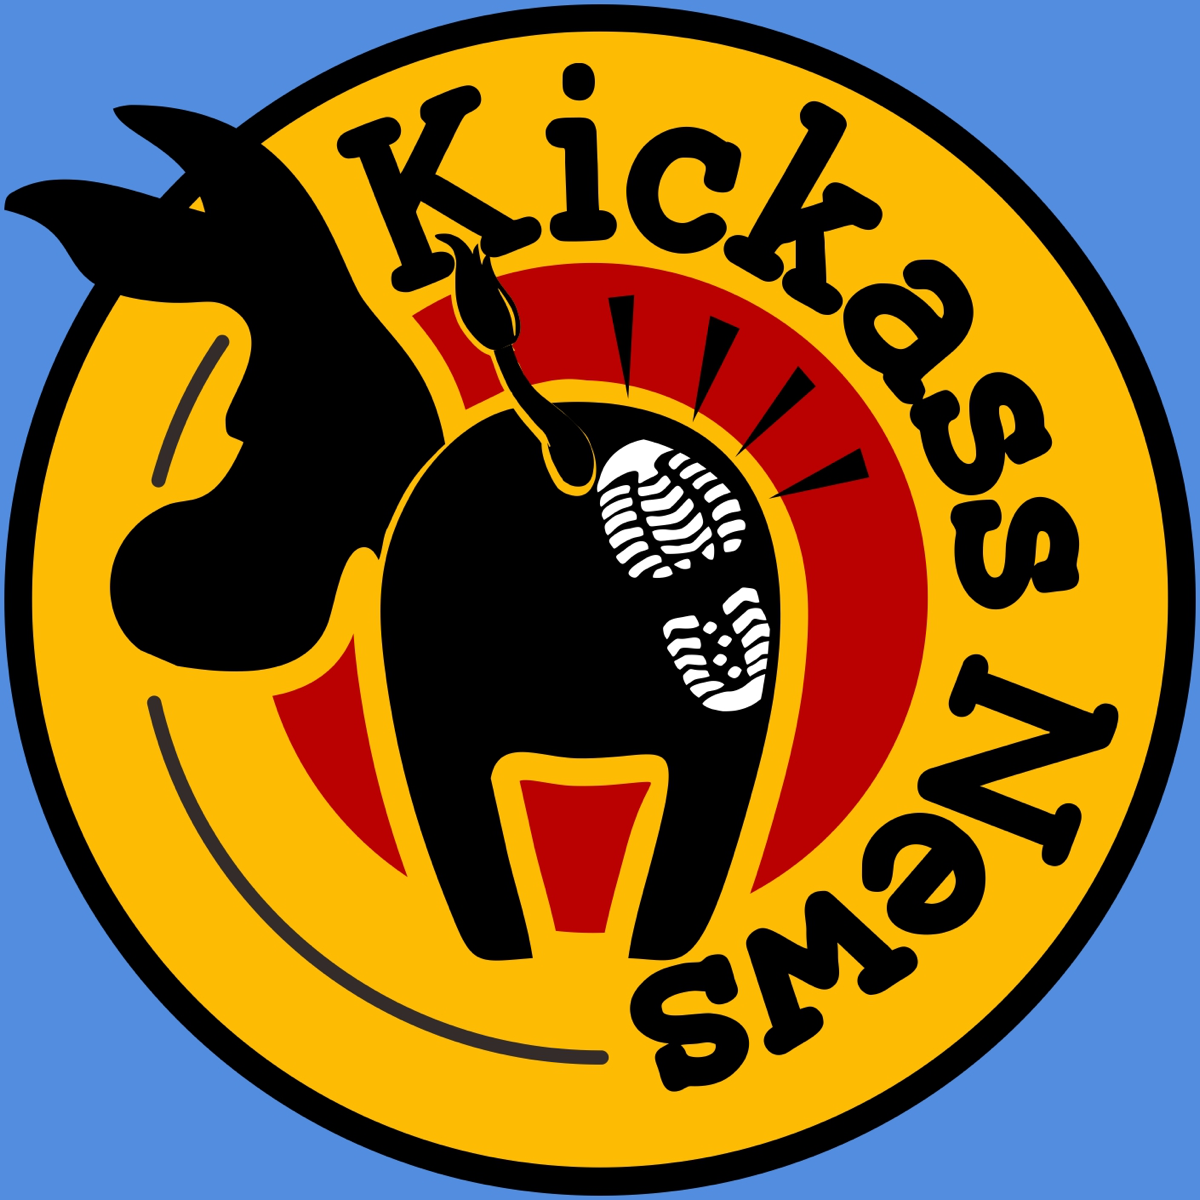 Podcast Cover of Kickass News